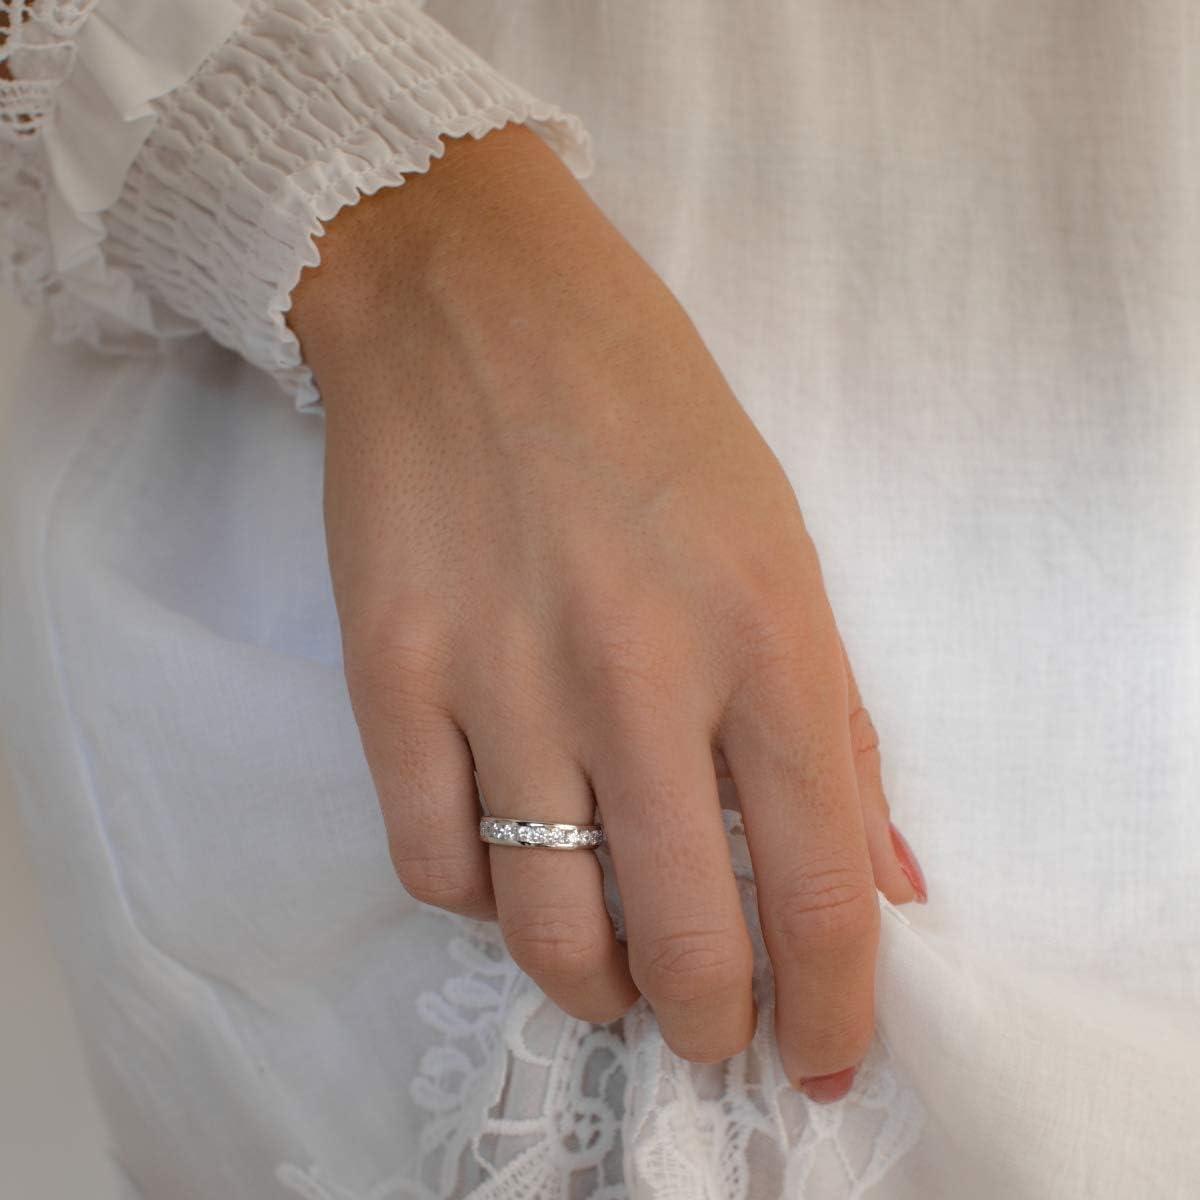 Tr/ésor 1934 Femme  Argent sterling 925  Argent|#Silver Balle   Blanc Zircon